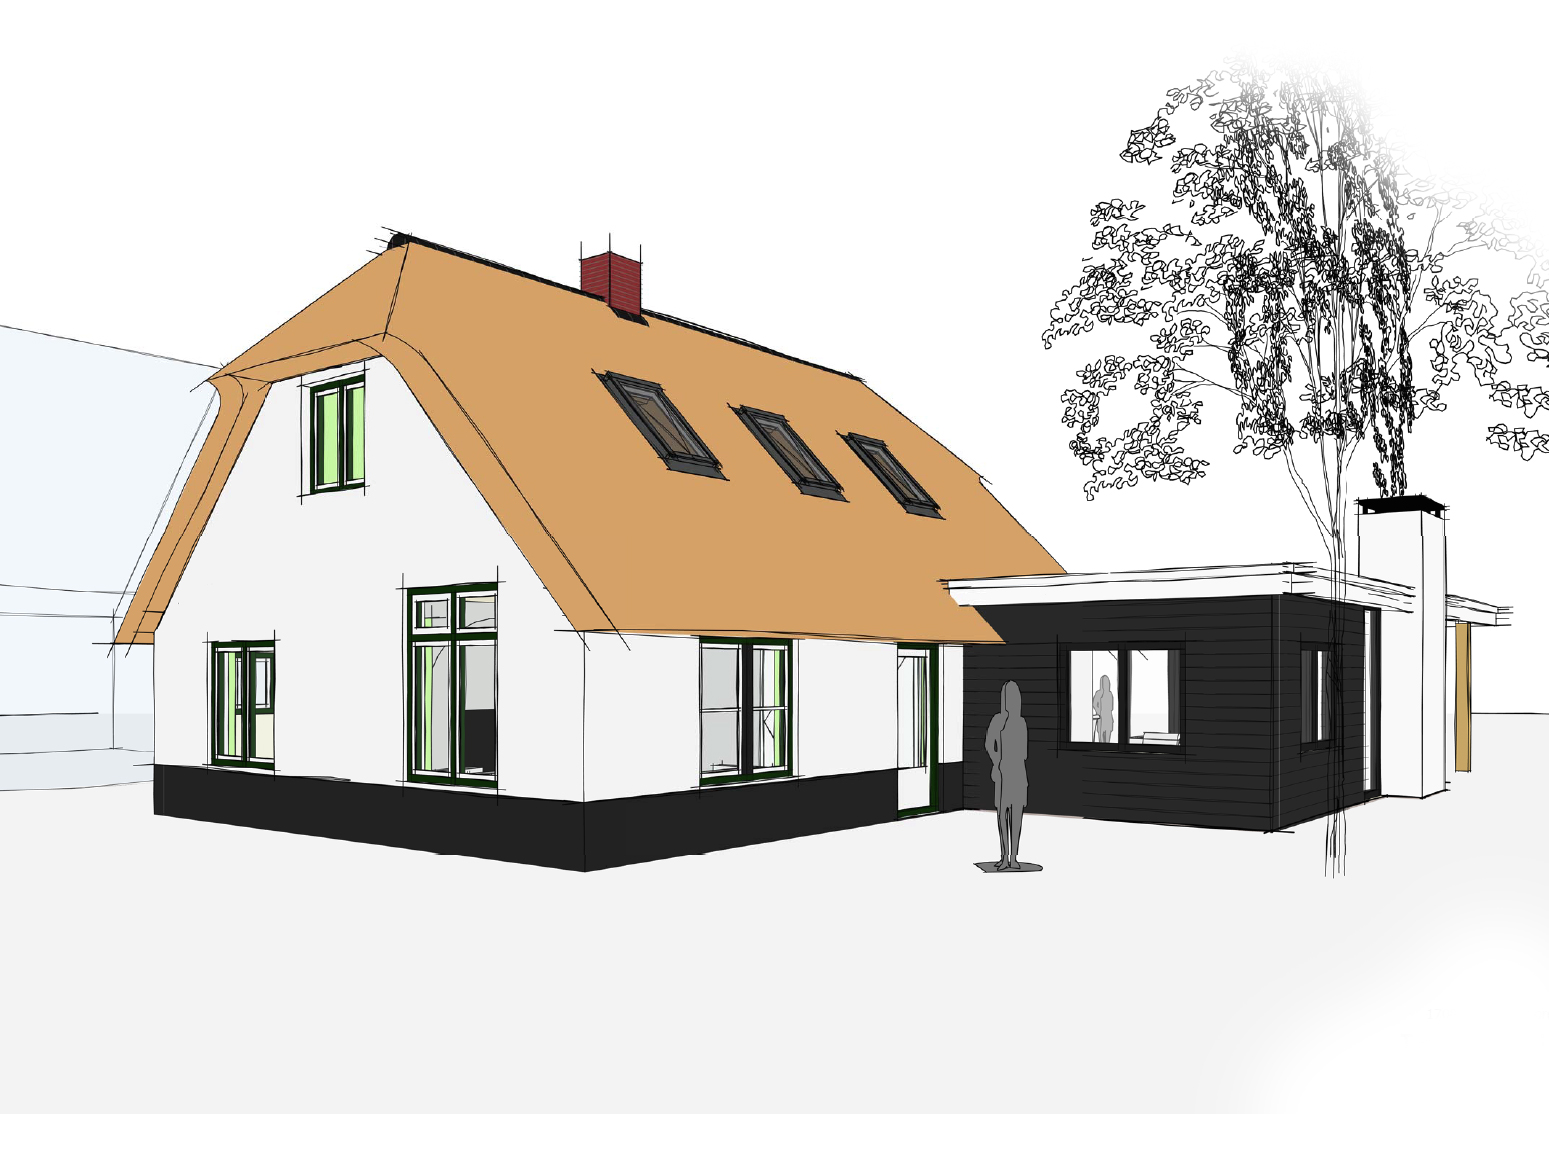 boerderij-verbouwing-uitbouw-beemte-broekland-van-oord-architectuur-en-design-wenum-wiesel-architect-voorst-architect-apeldoorn